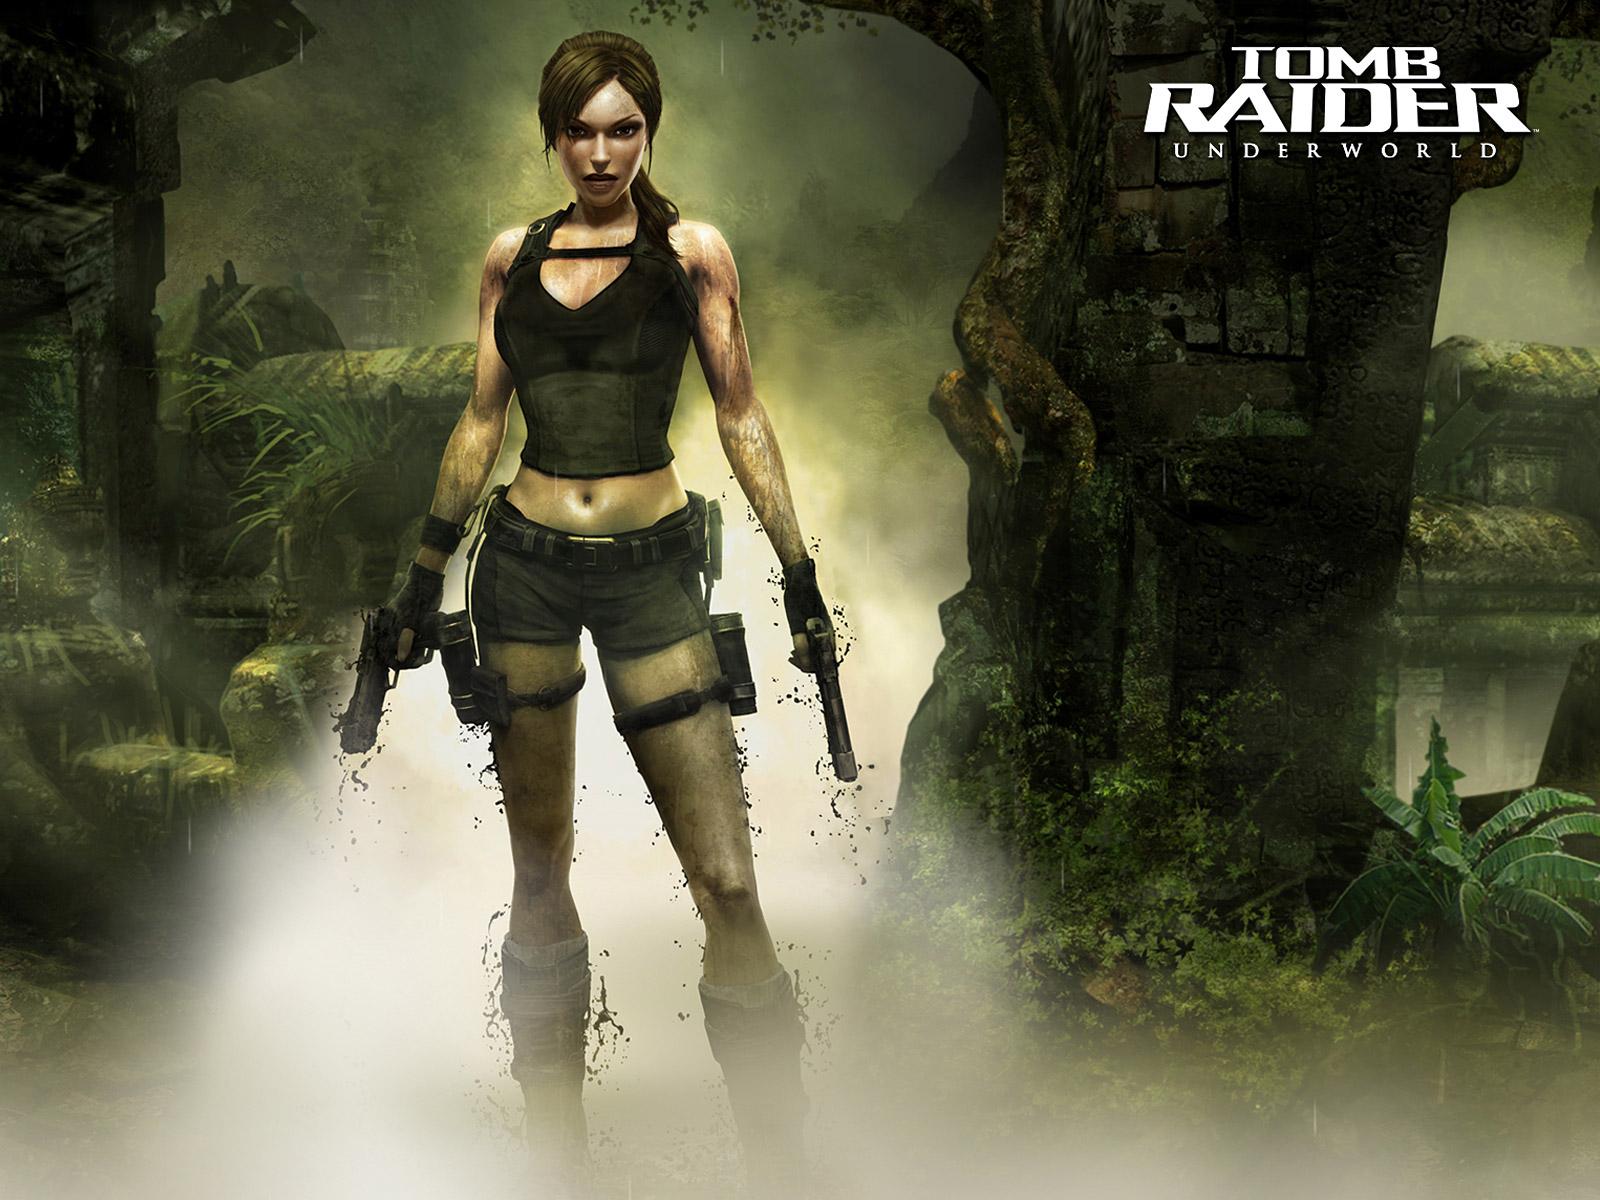 http://3.bp.blogspot.com/_E26Ndy_oKVc/TNIsh3FgwjI/AAAAAAAAALA/6MXM8nwn-YE/s1600/Tomb+Raider+Underworld+%284%29.jpg